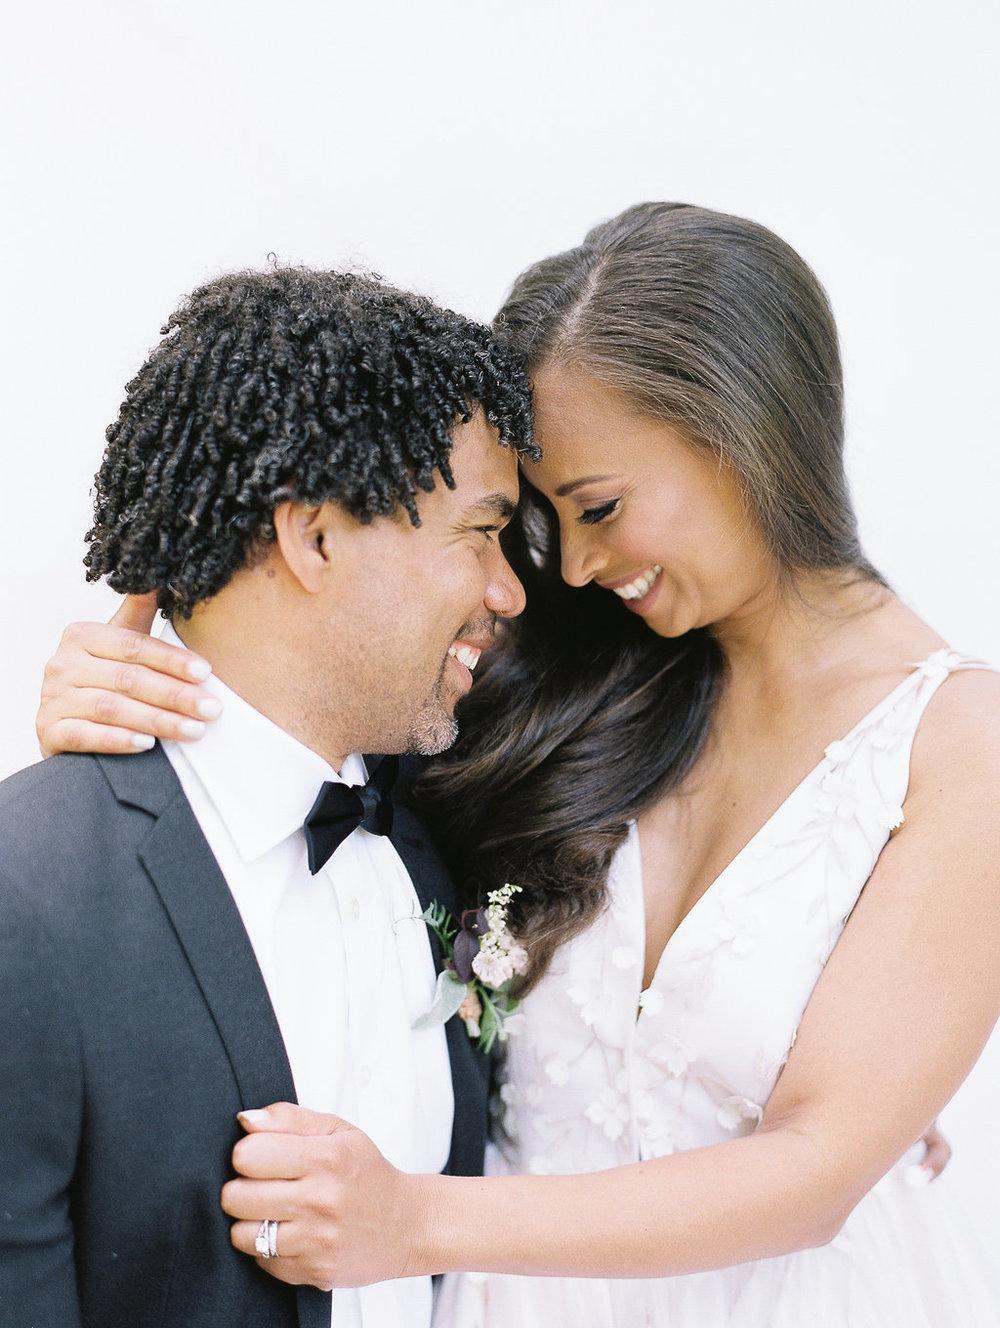 Adoption-editorial-marietta-conference-cetner-wedding-atlanta-wedding-photographer-9.jpg